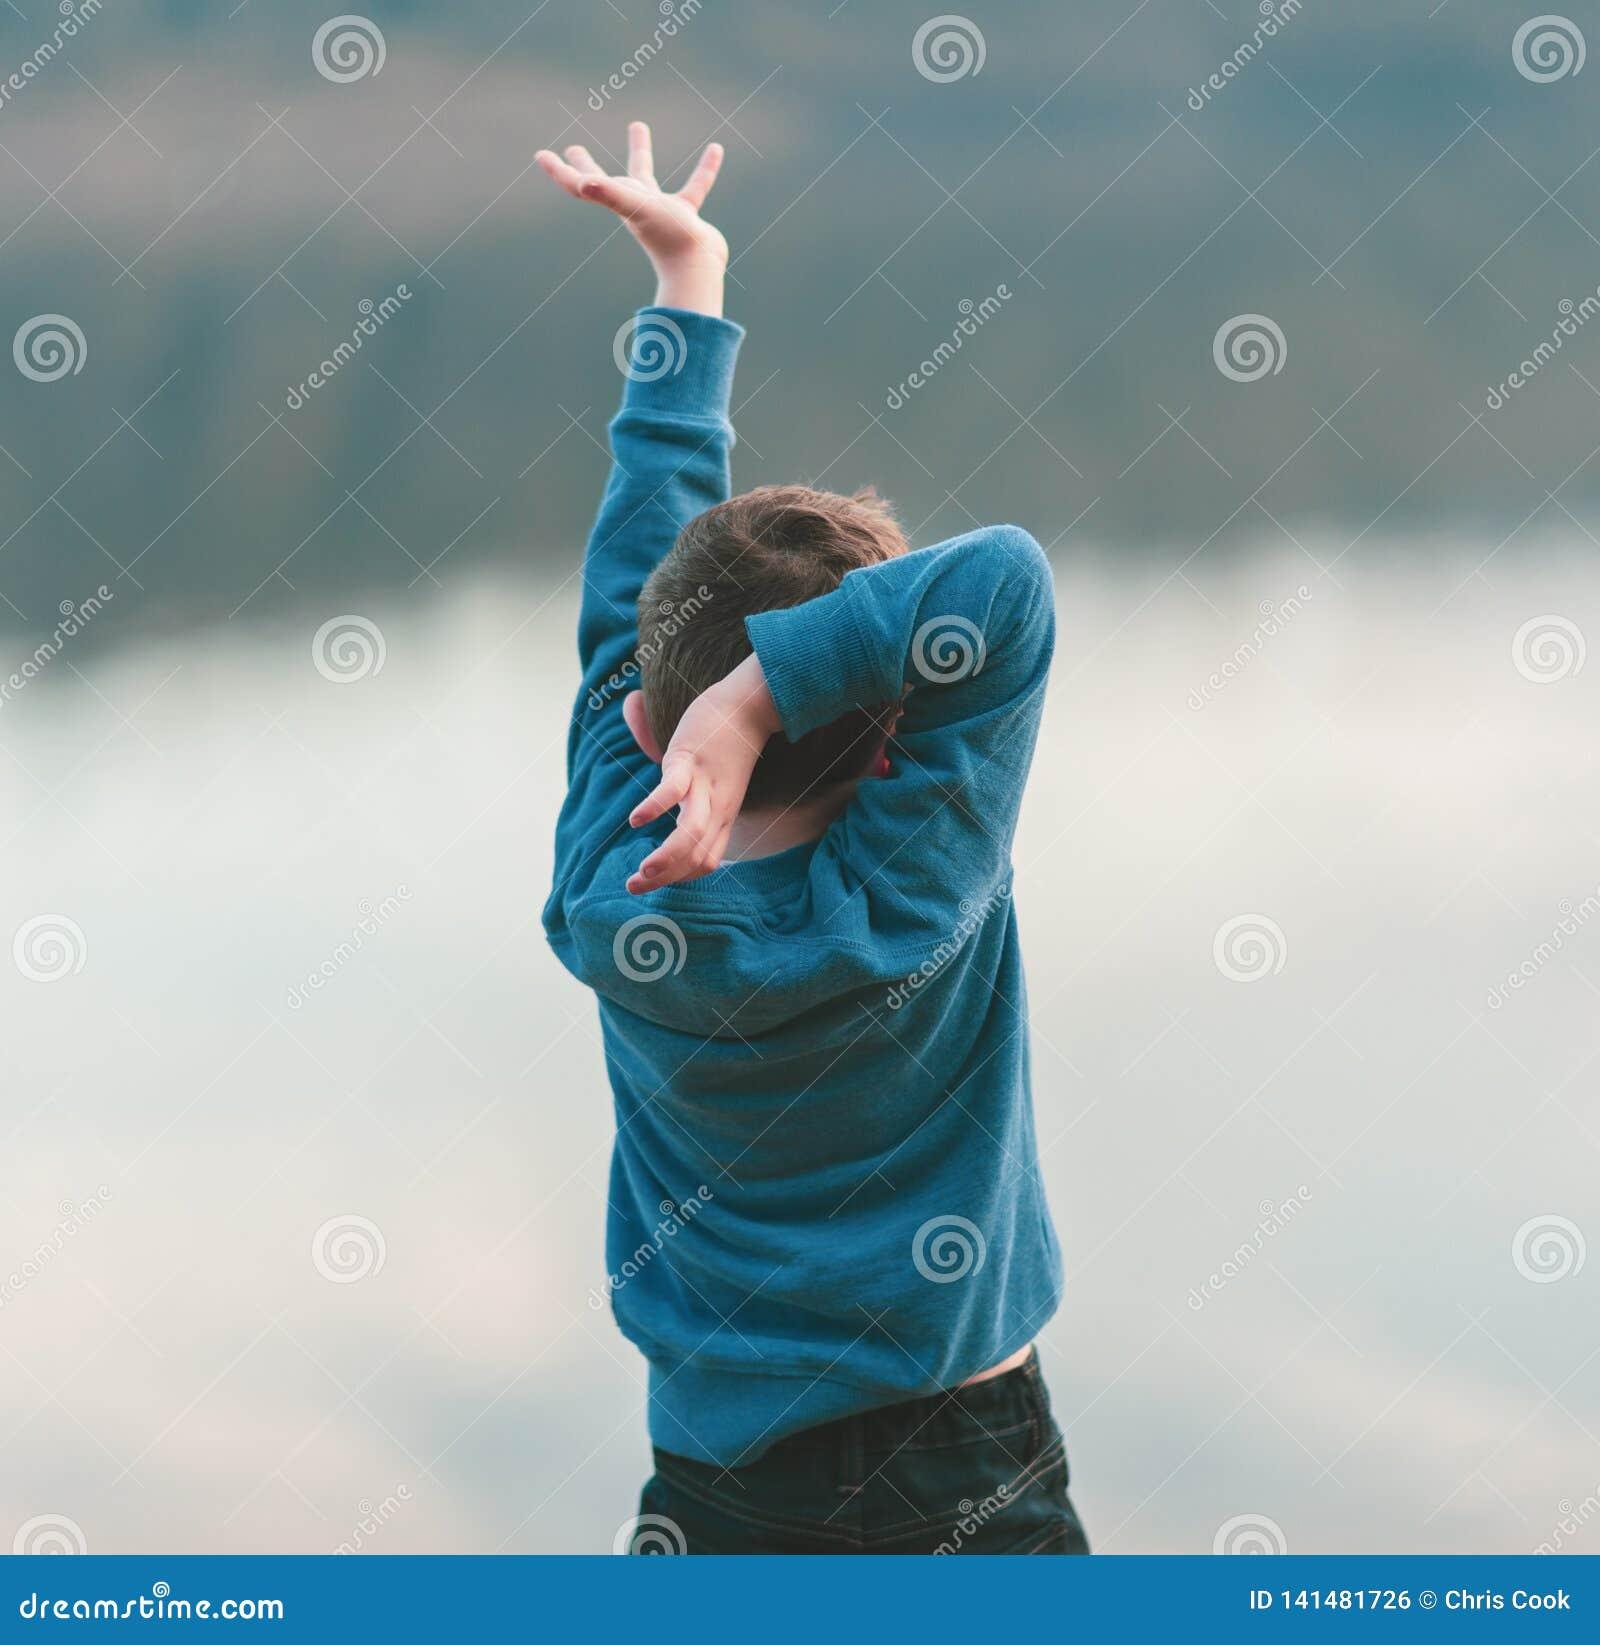 A small boy dances against a river backdrop